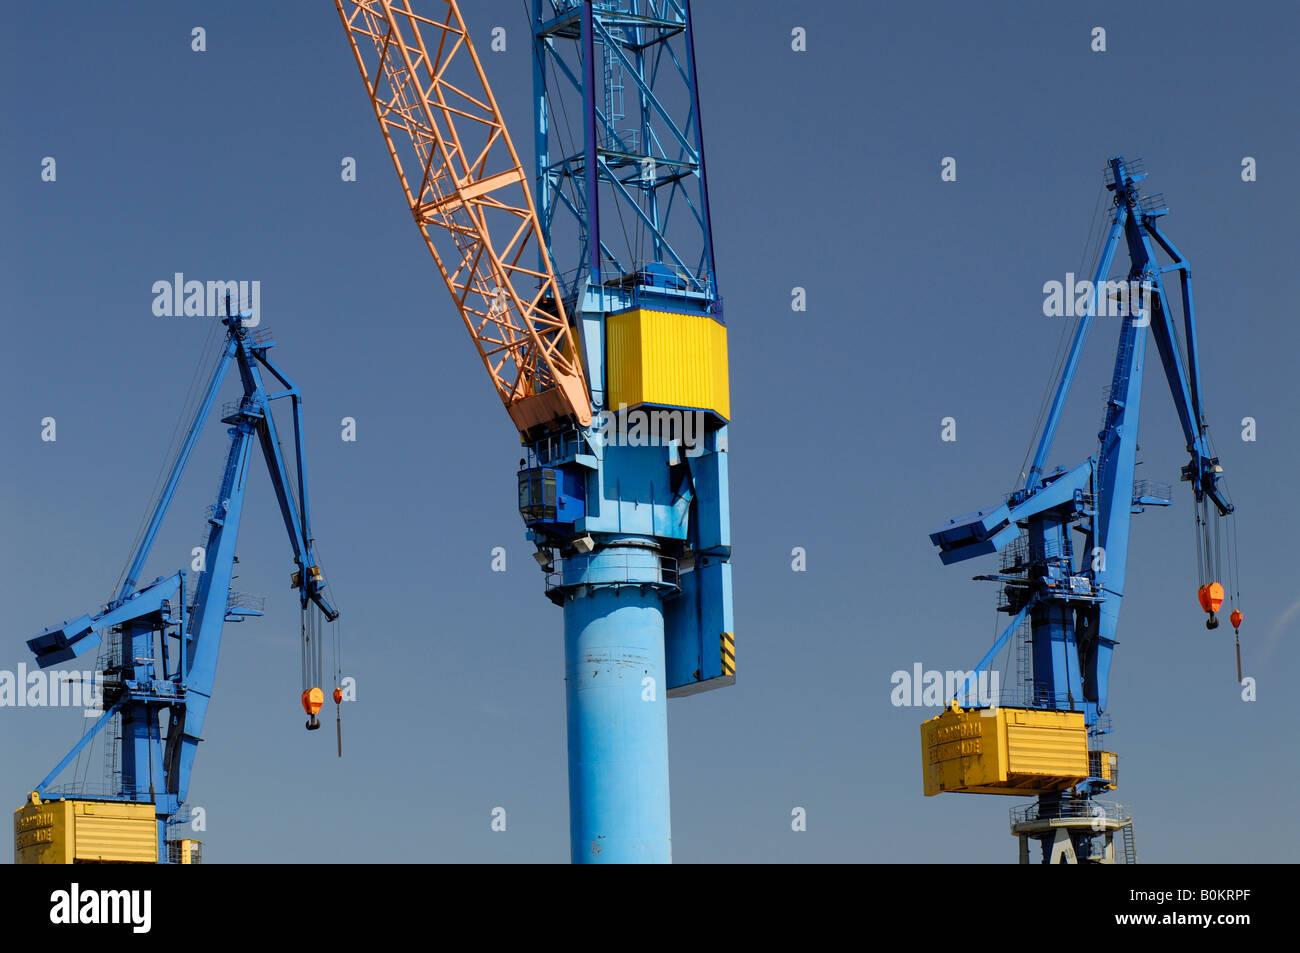 Harbor cranes in the Hamburg harbor - Stock Image